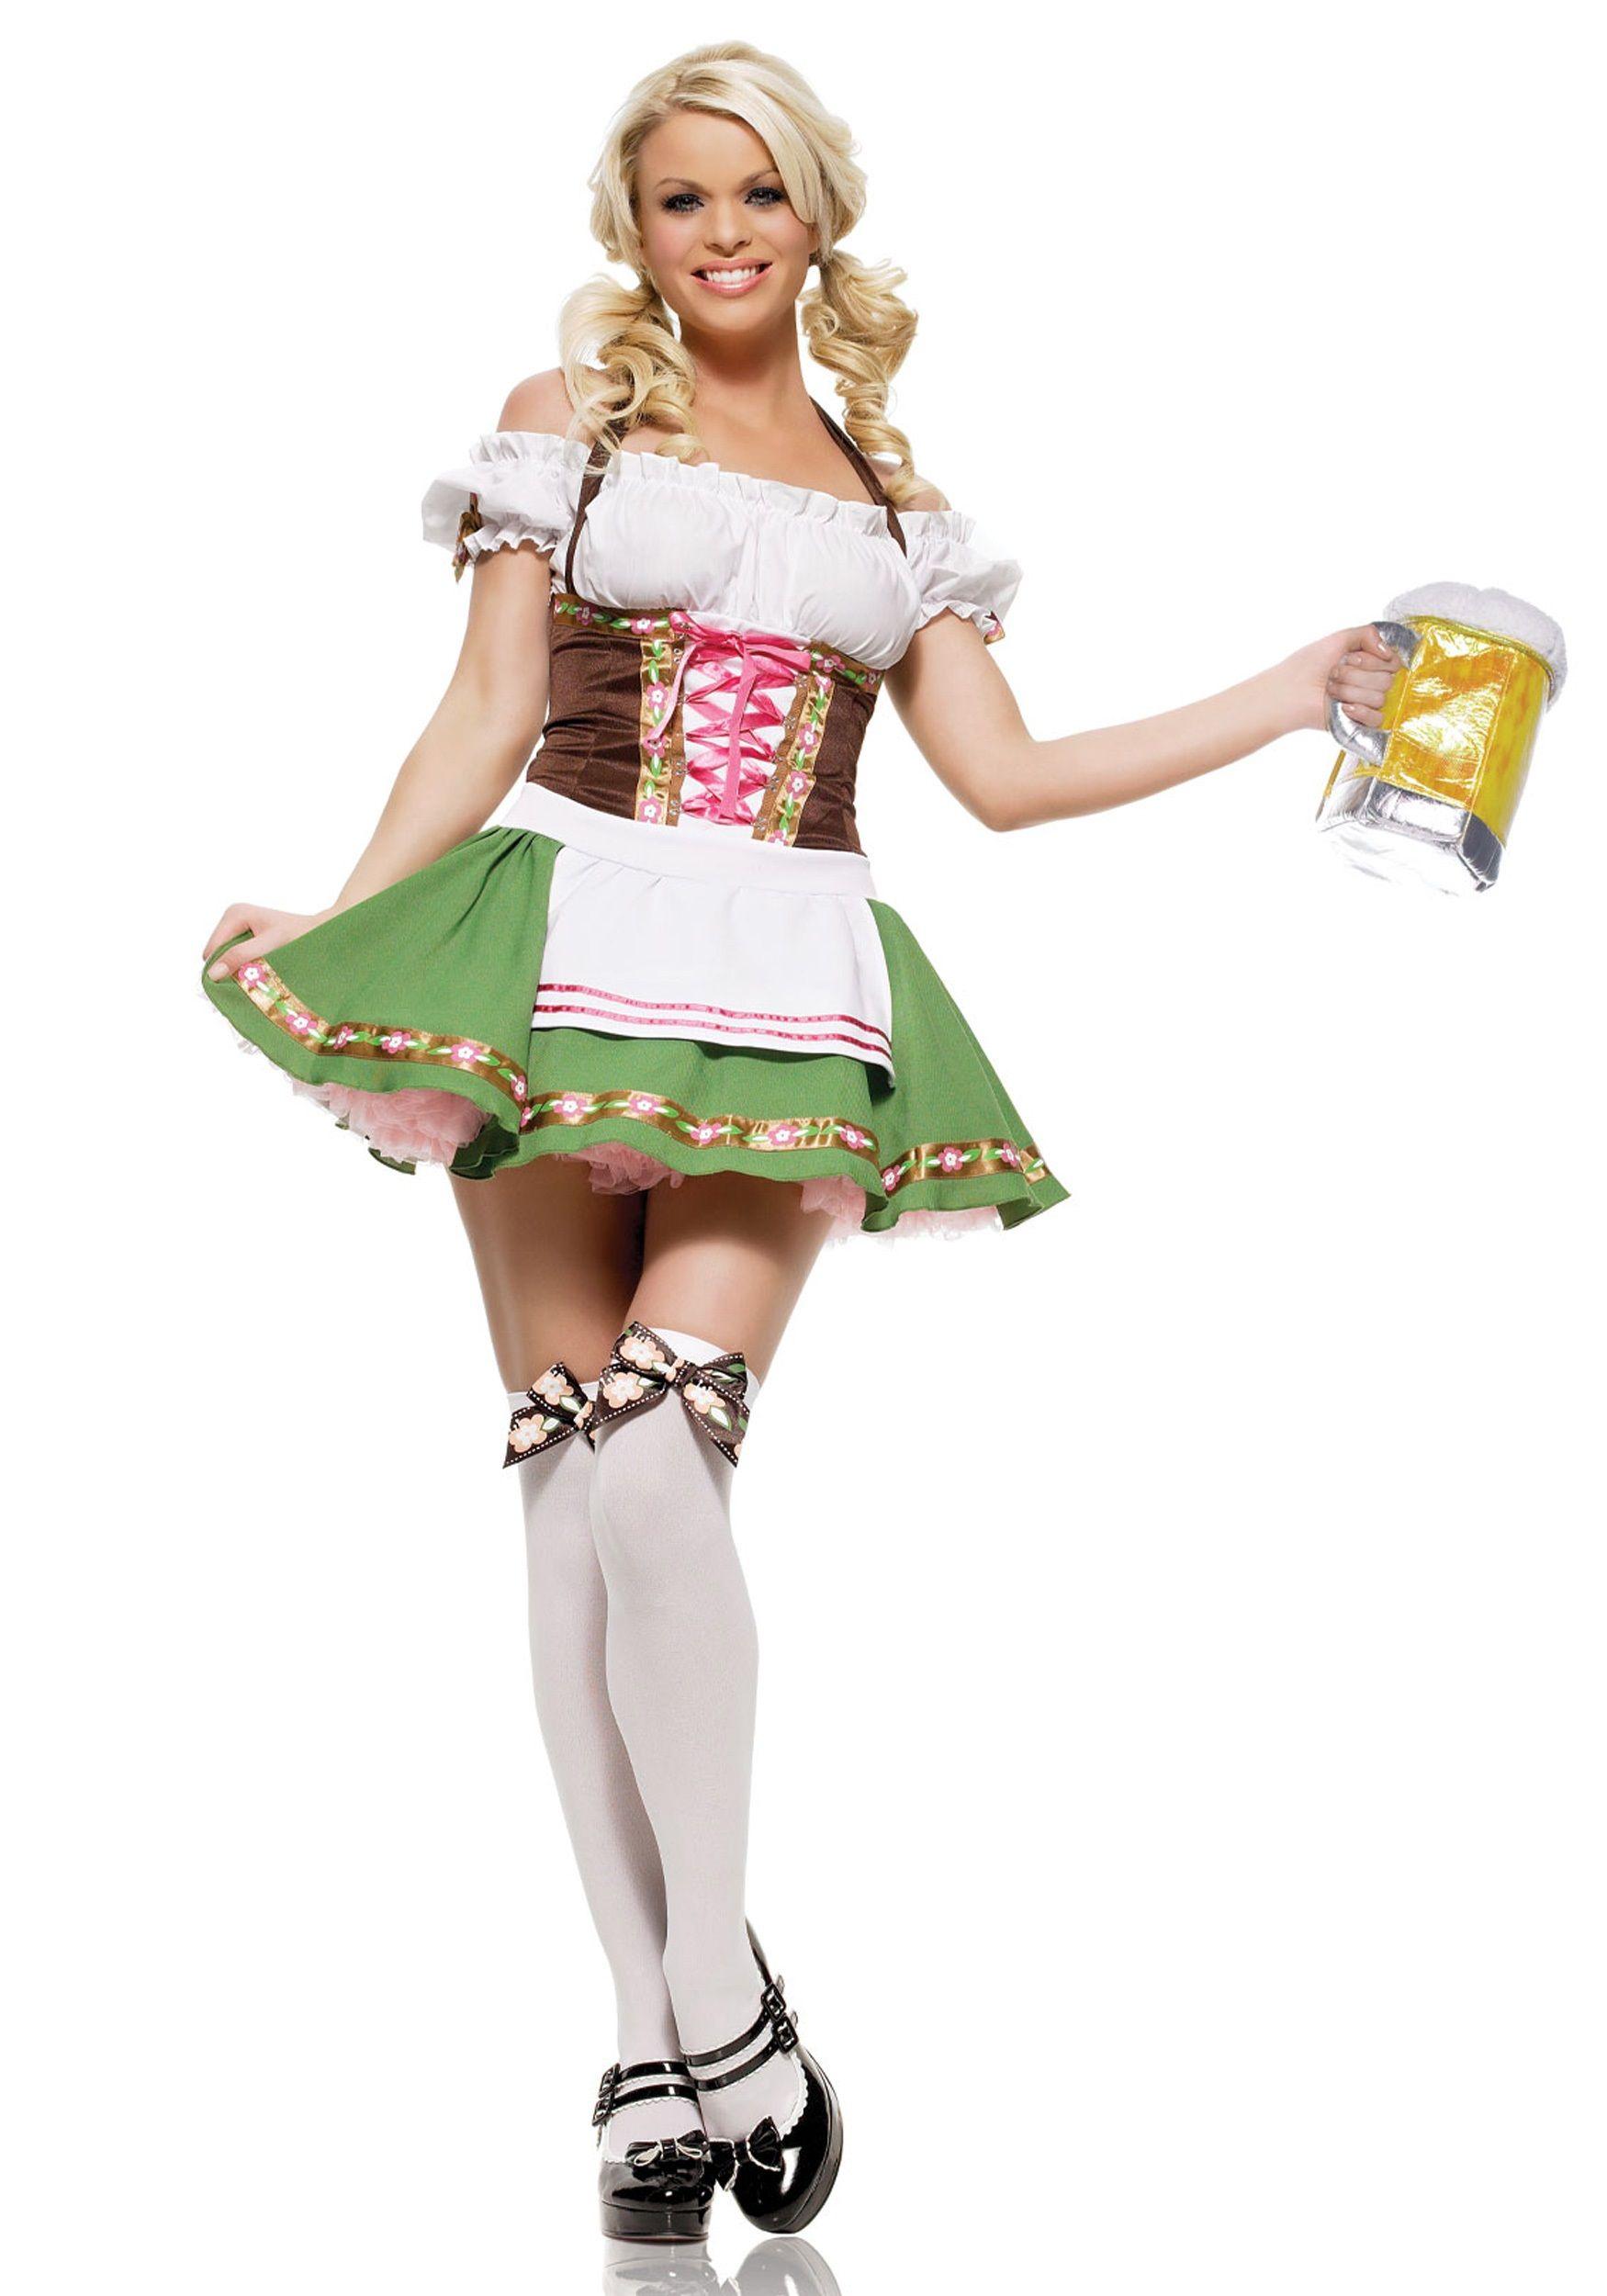 Our playful Oktoberfest Dirndl Dress features a short black/white polka dot  skirt edged in